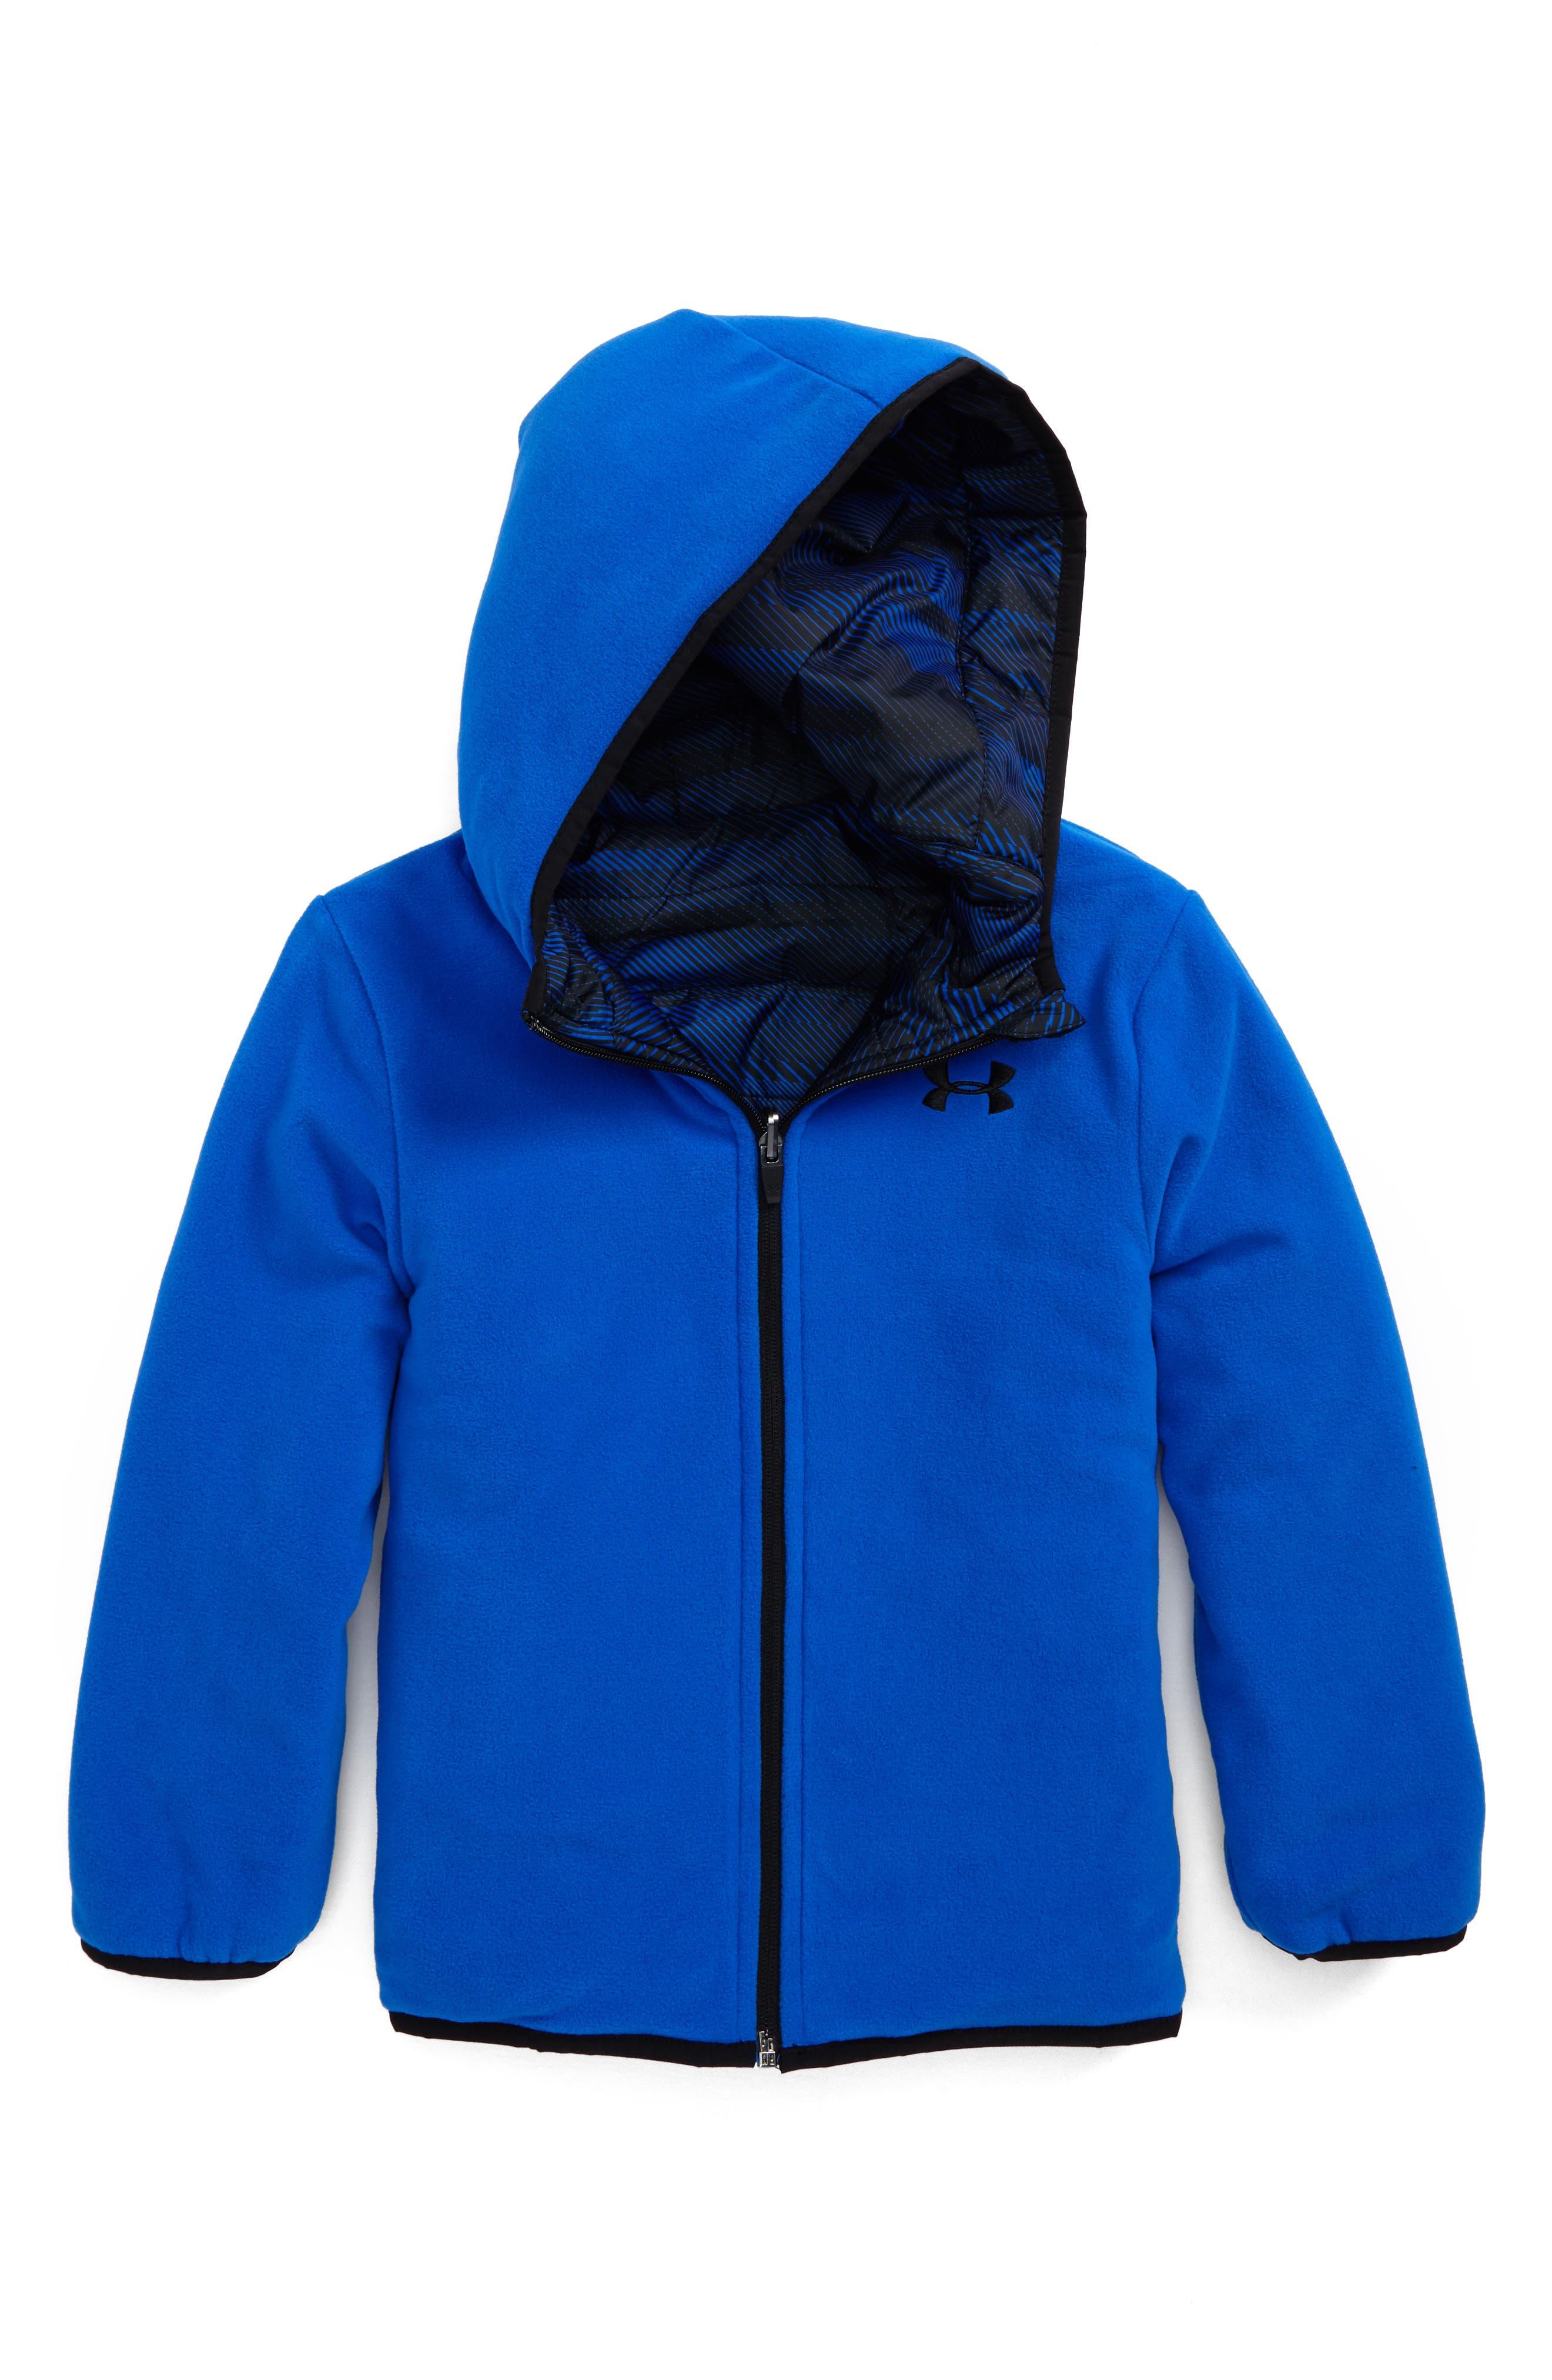 Alternate Image 2  - Under Armour Speedlines ColdGear® Reversible Puffer Jacket (Toddler Boys & Little Boys)